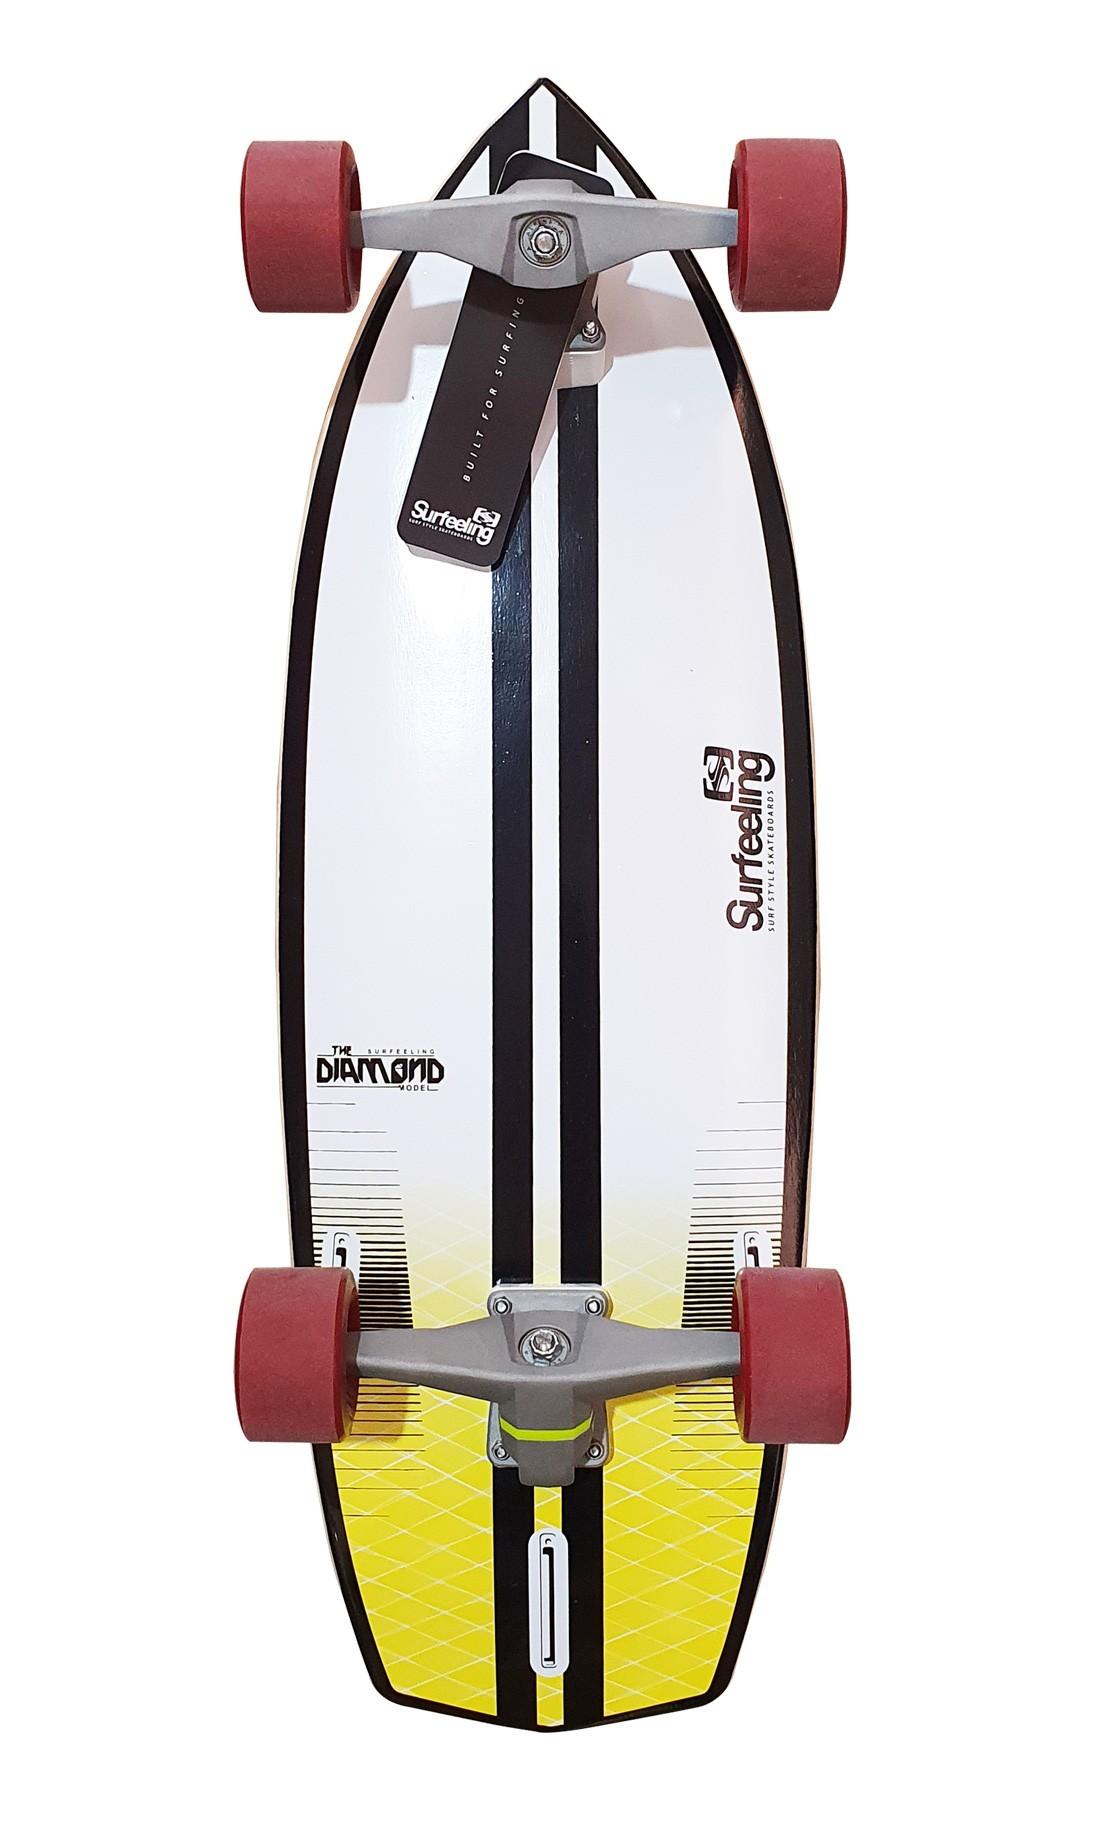 Simulador de Surf Skateboard Surfeeling Diamond